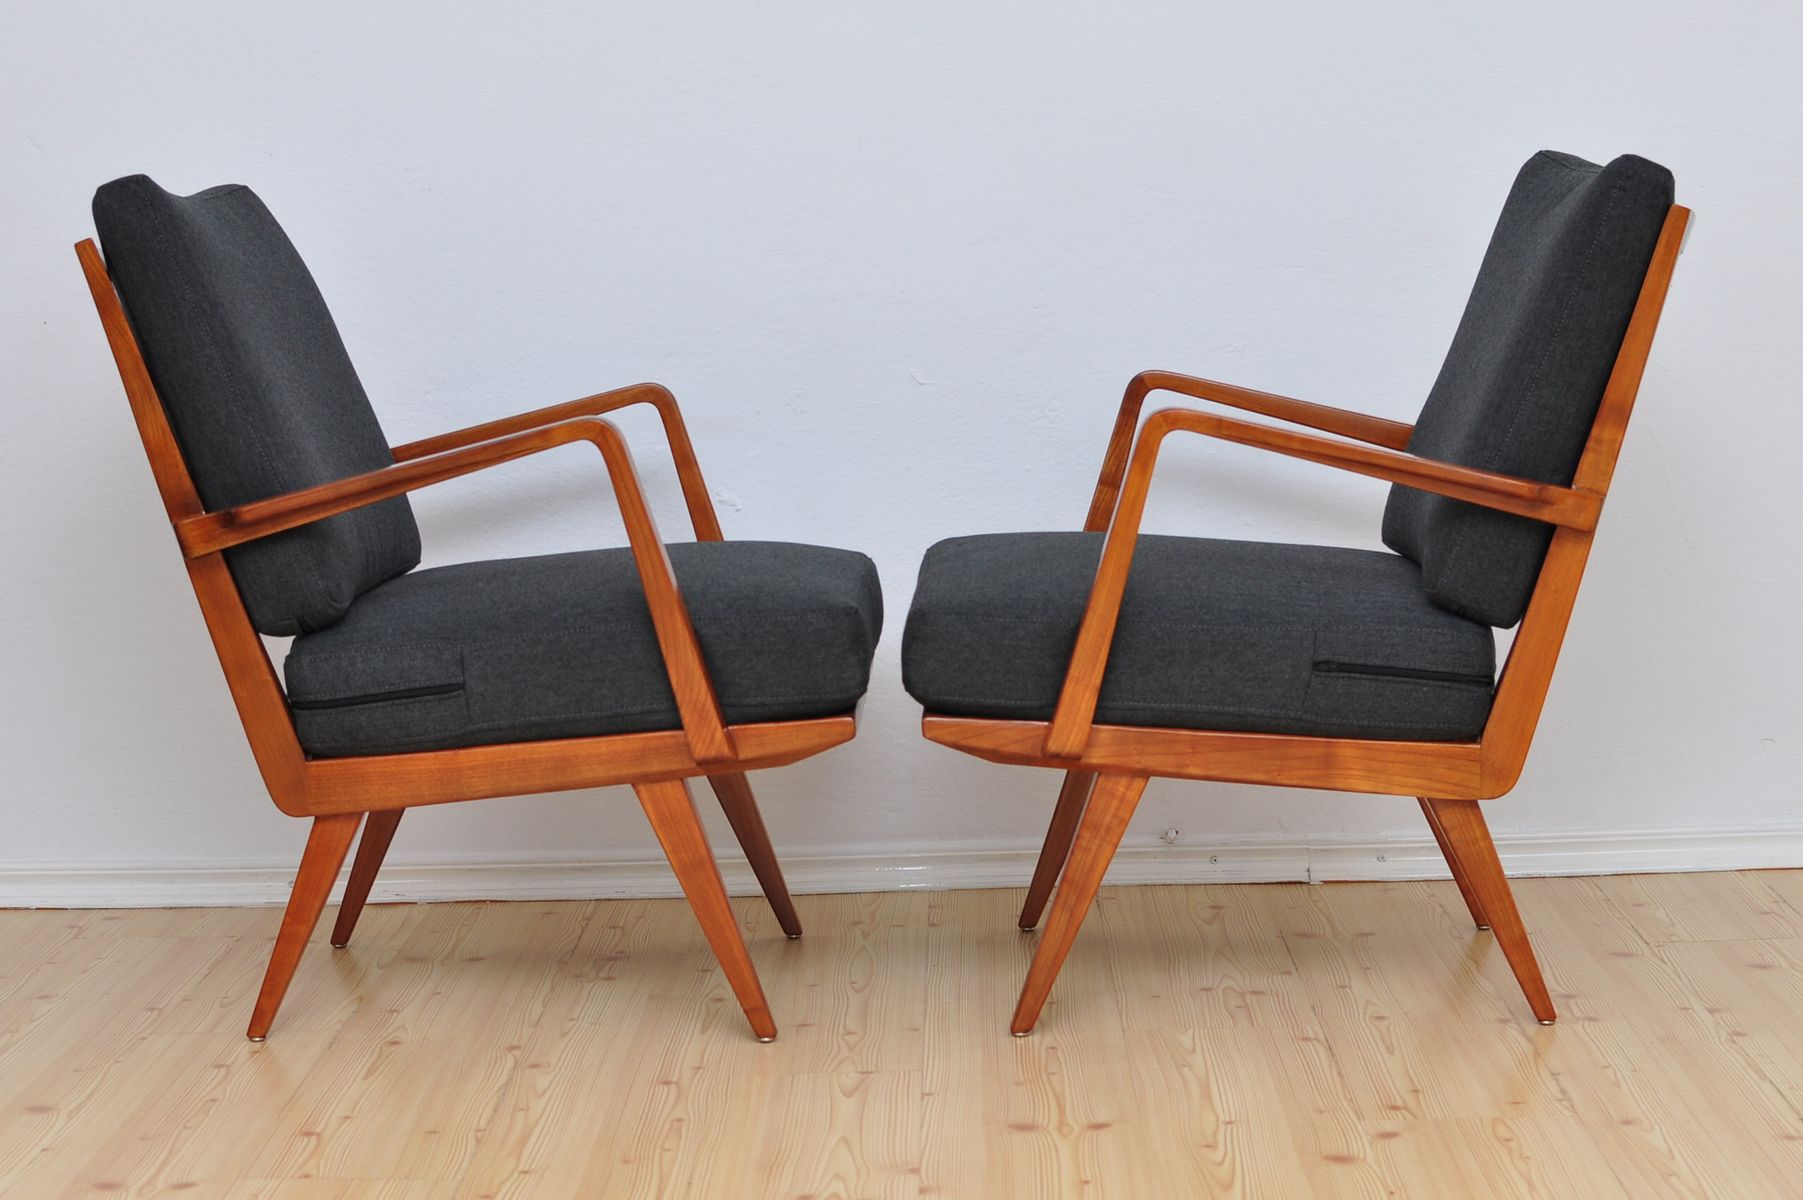 walter knoll sessel walter knoll linvingplatform sessel. Black Bedroom Furniture Sets. Home Design Ideas